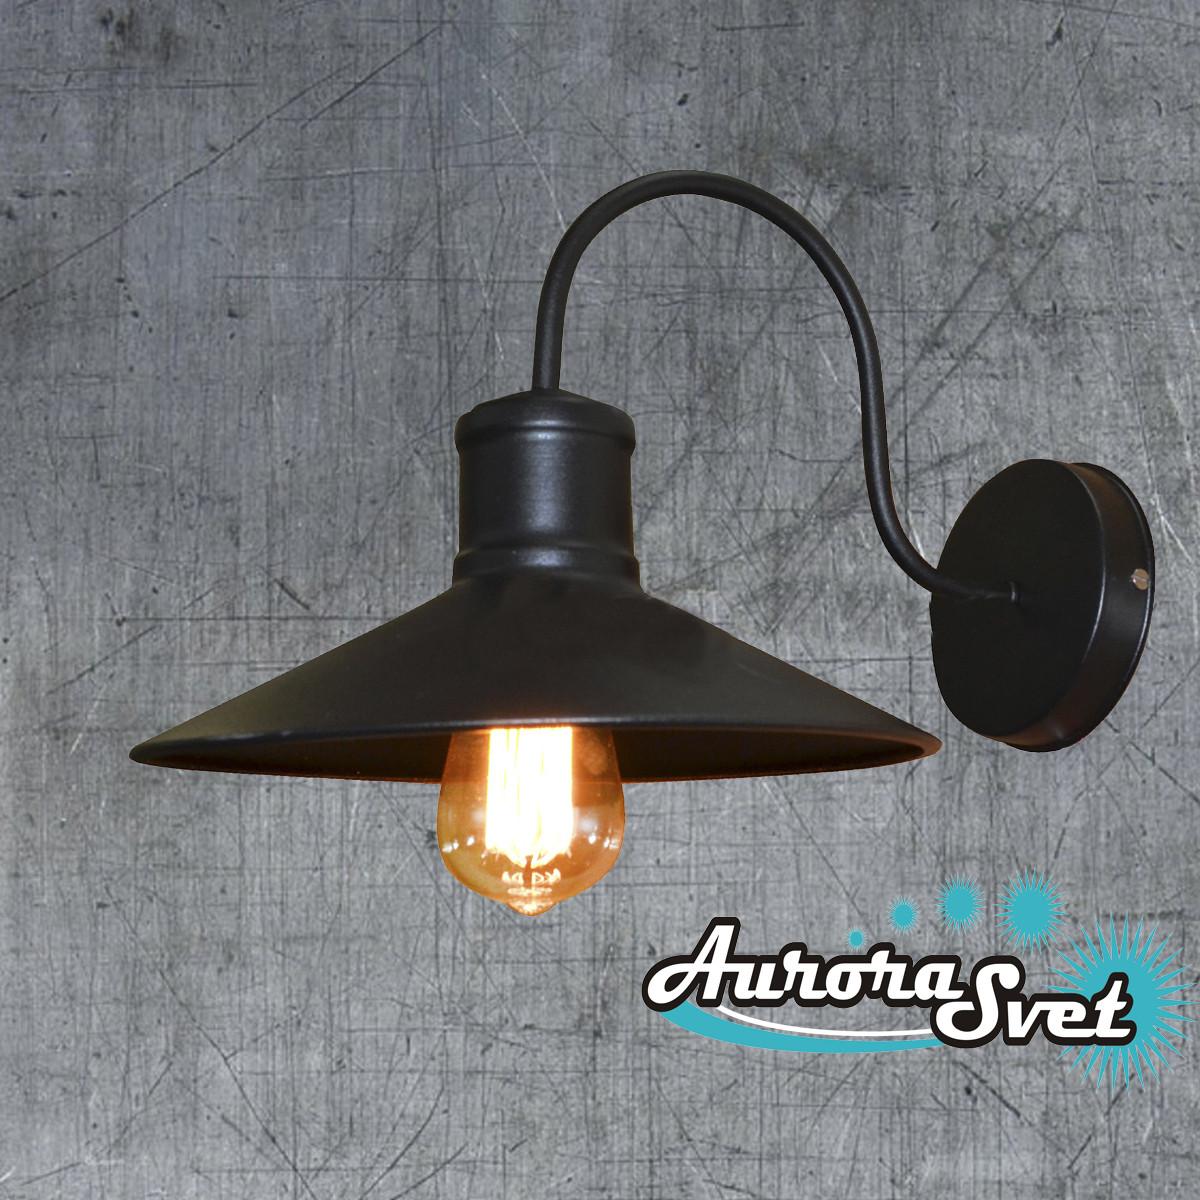 Бра настенная AuroraSvet loft 9400 чёрная.LED светильник бра. Светодиодный светильник бра.